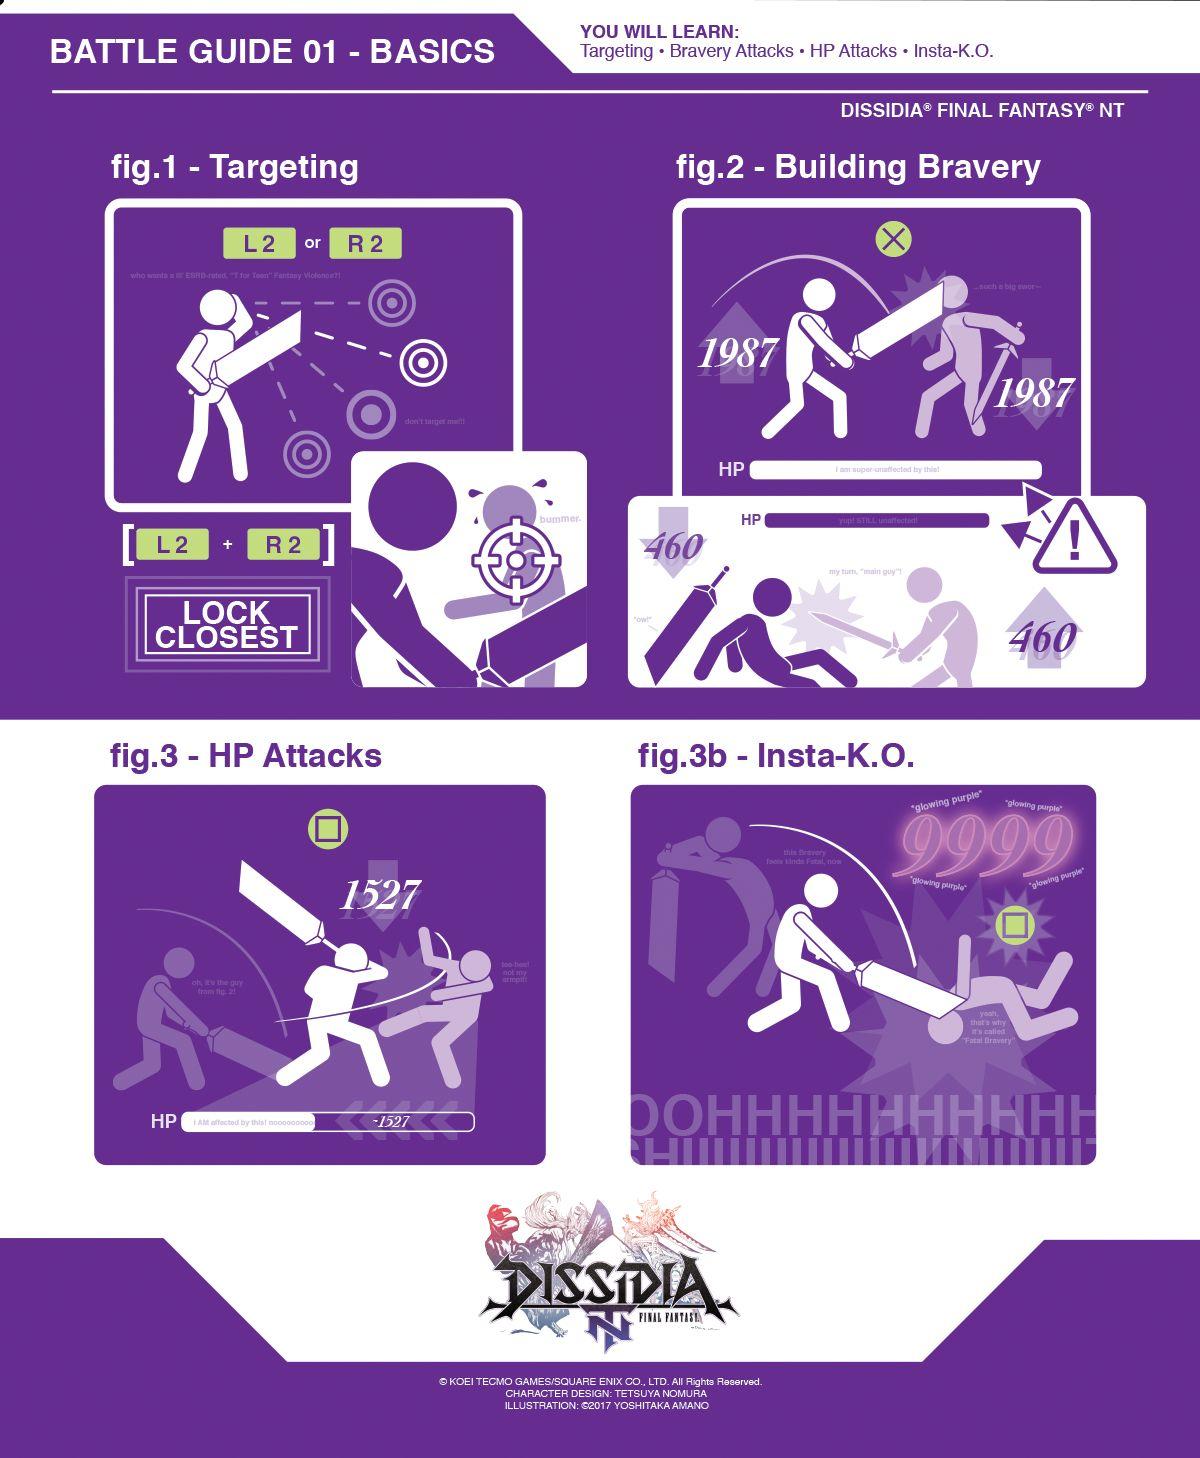 Dissidia Final Fantasy NT Tutorial 01